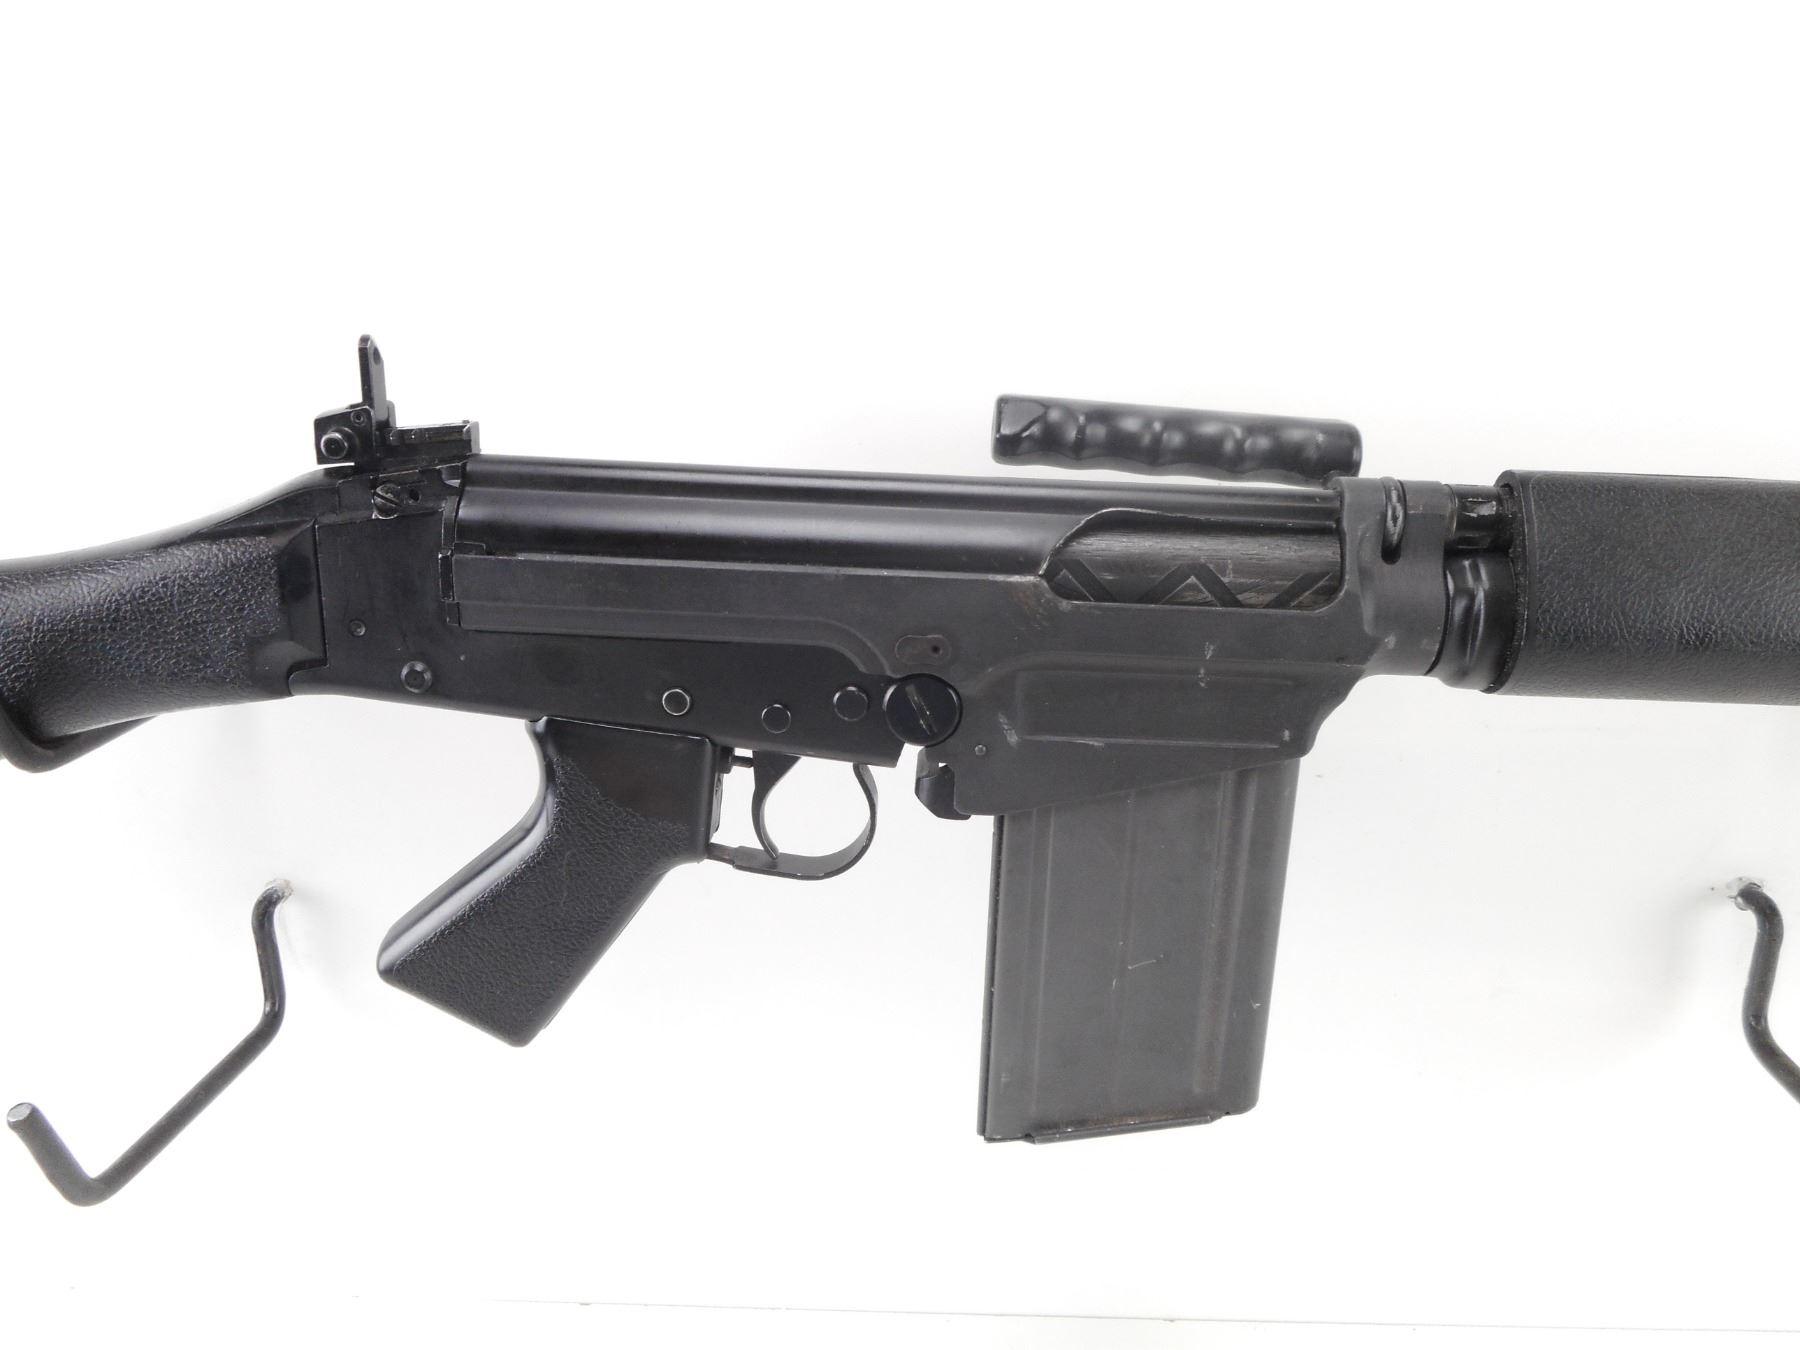 Gunlistings.org - Rifles FN FAL L1A1